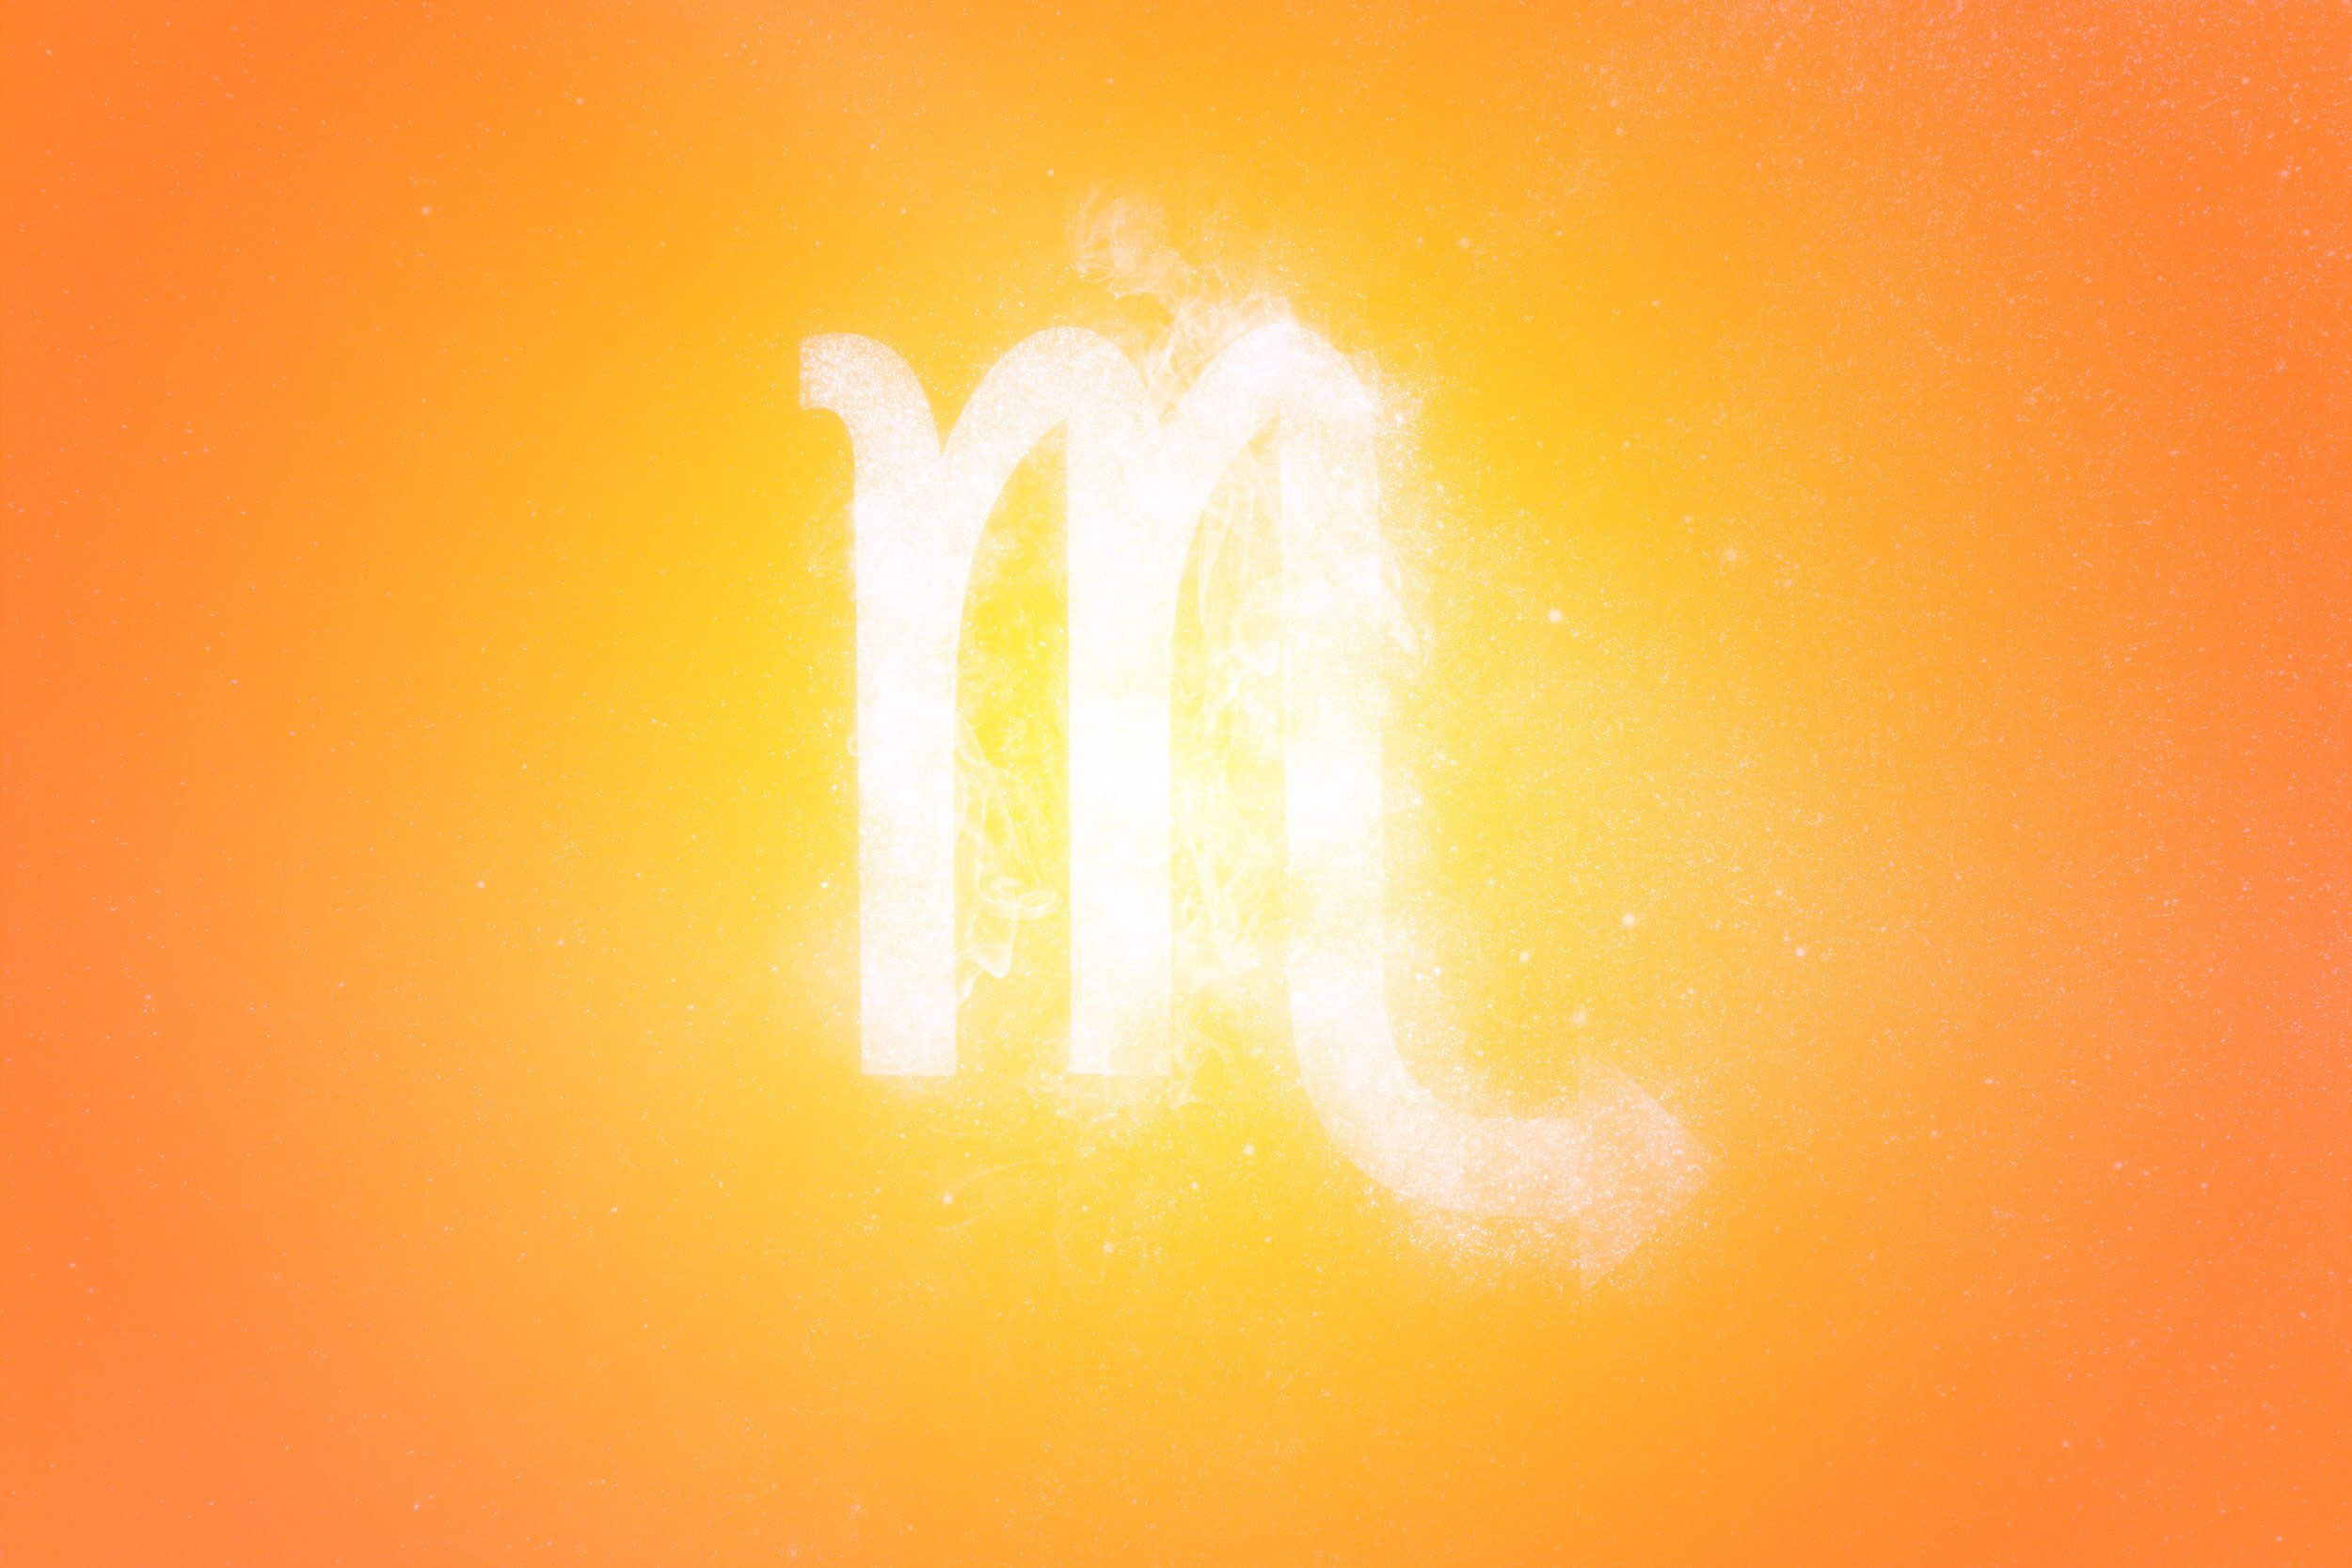 Scorpio Zodiac Sign. Abstract sky background